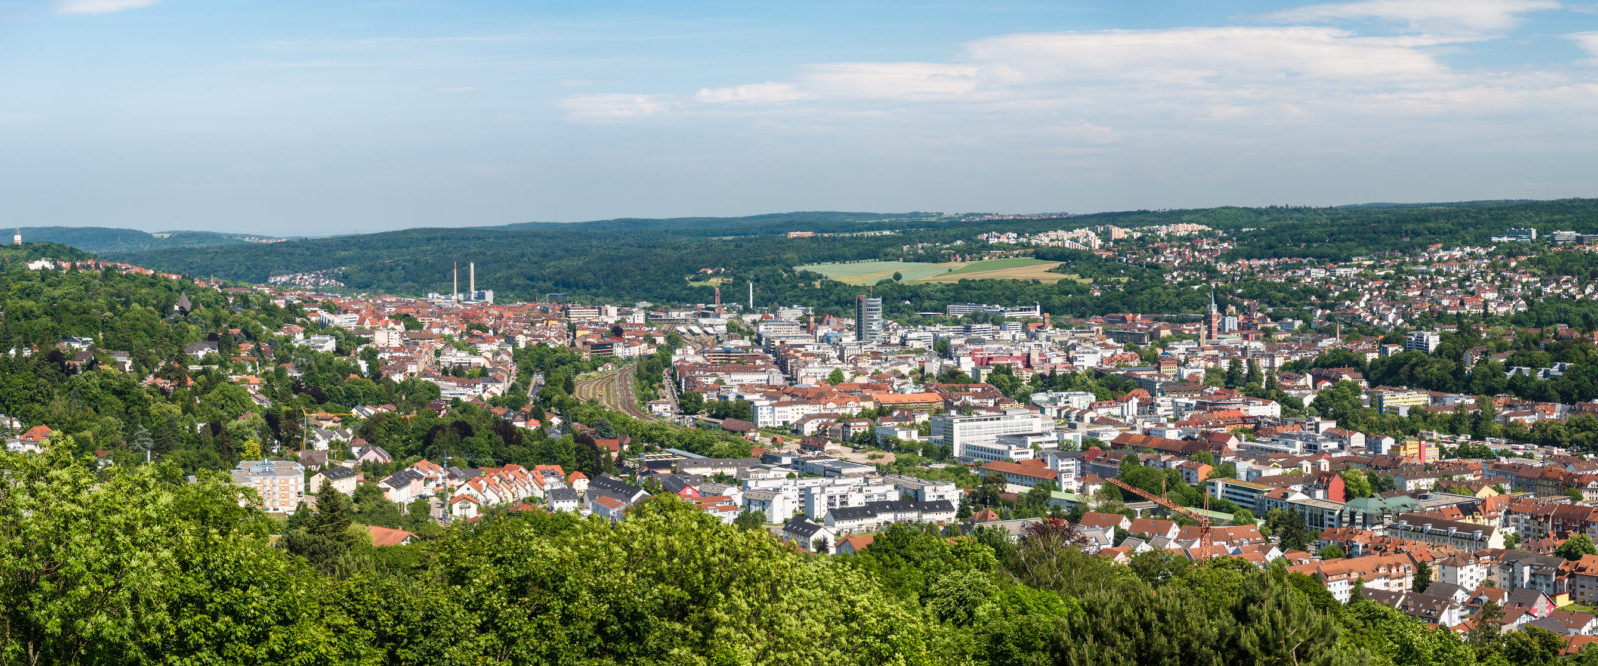 Altenheim Pforzheim